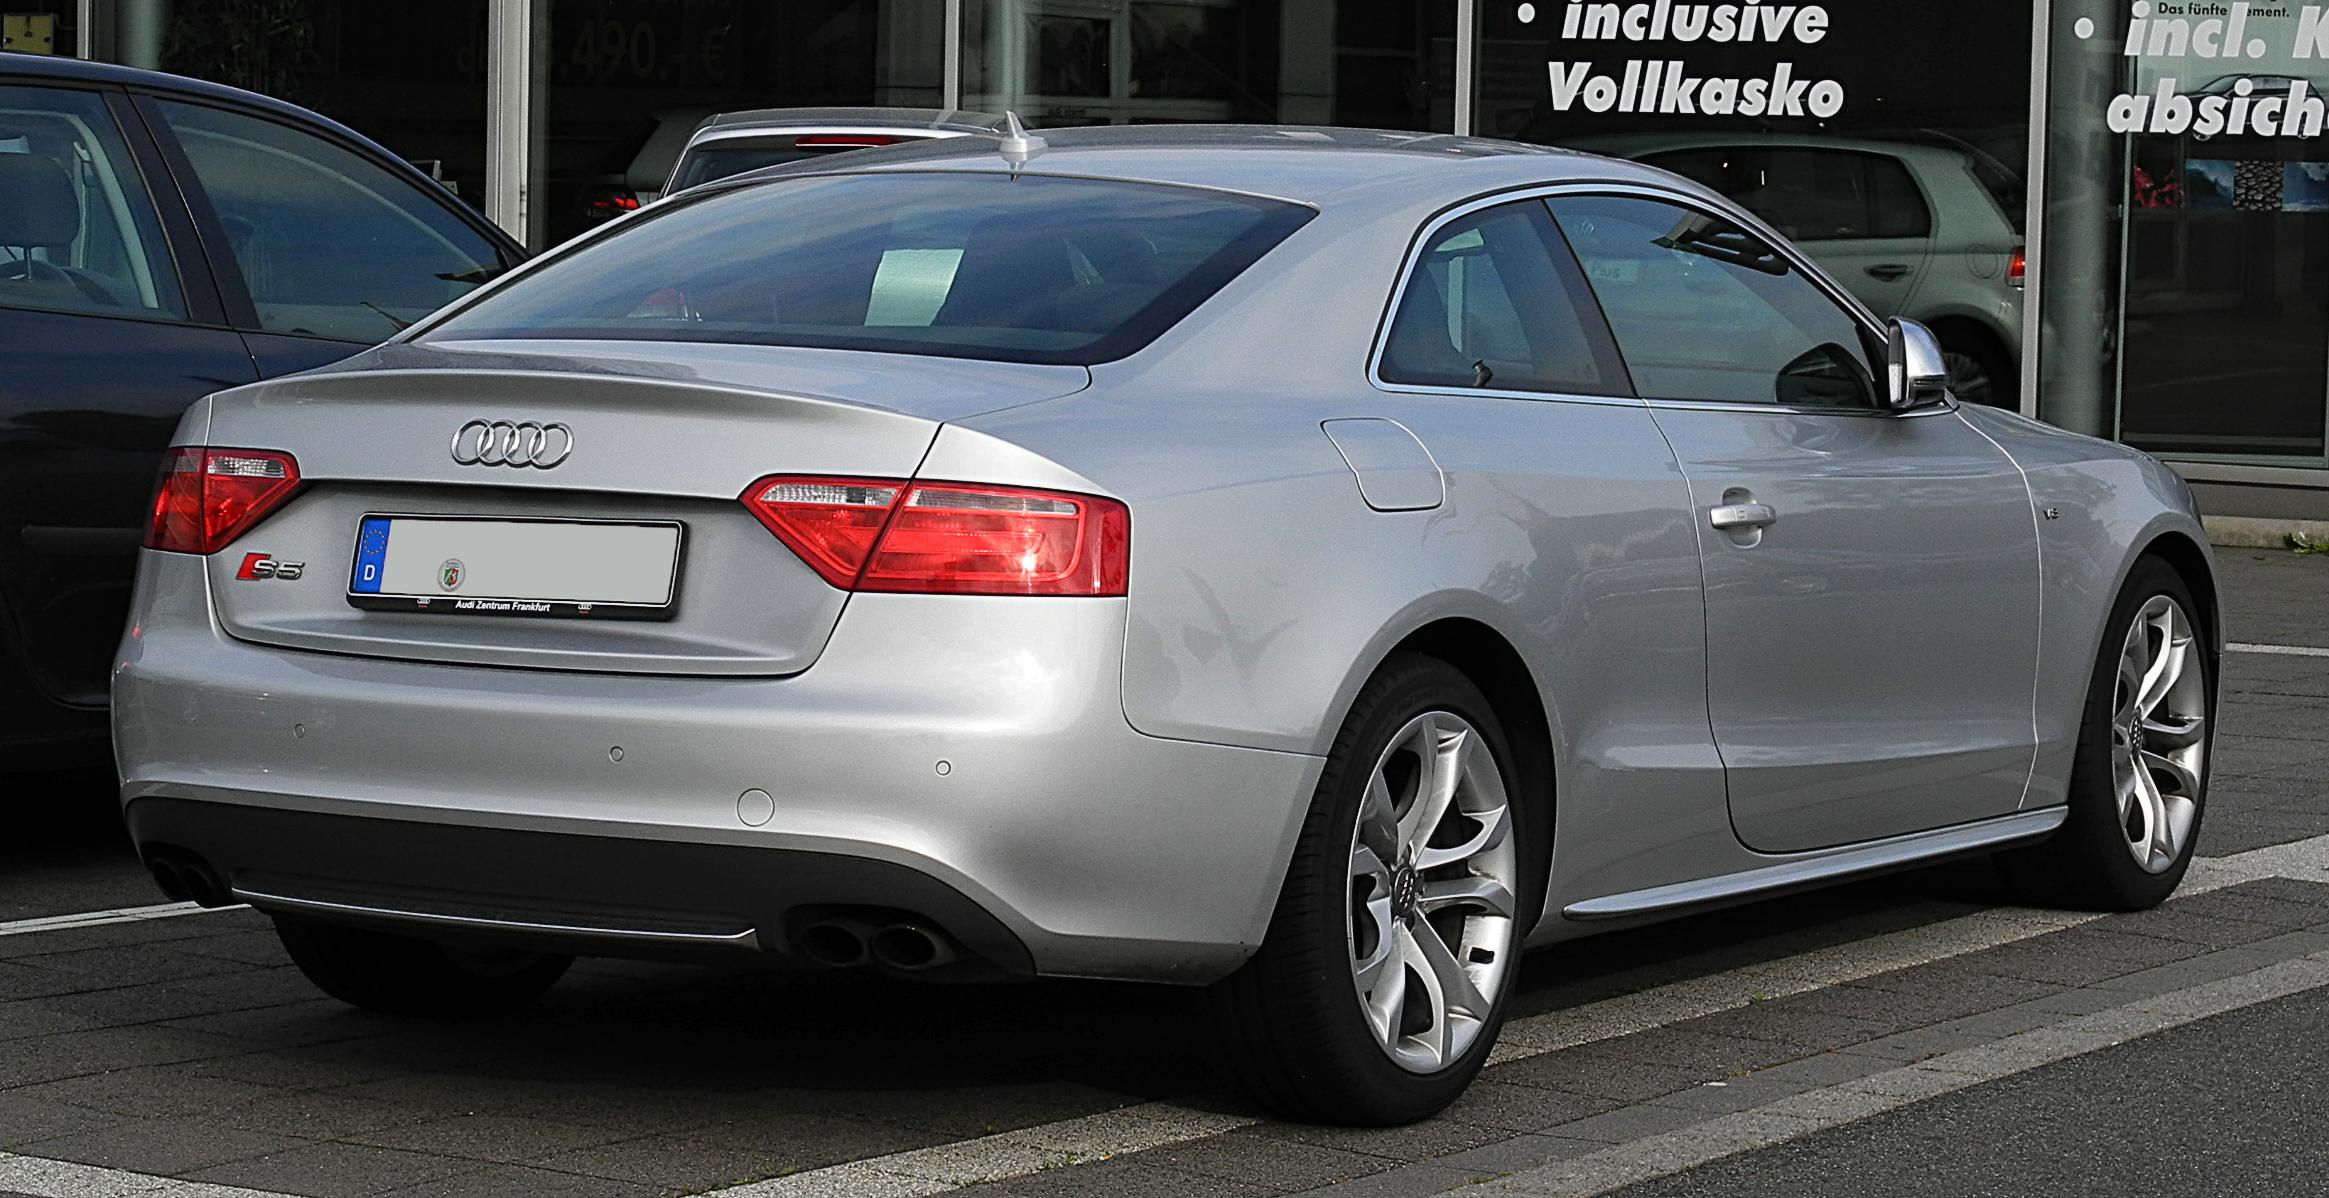 Build Your Own Audi >> File:Audi S5 Coupé – Heckansicht, 3. Juli 2011, Velbert.jpg - Wikimedia Commons